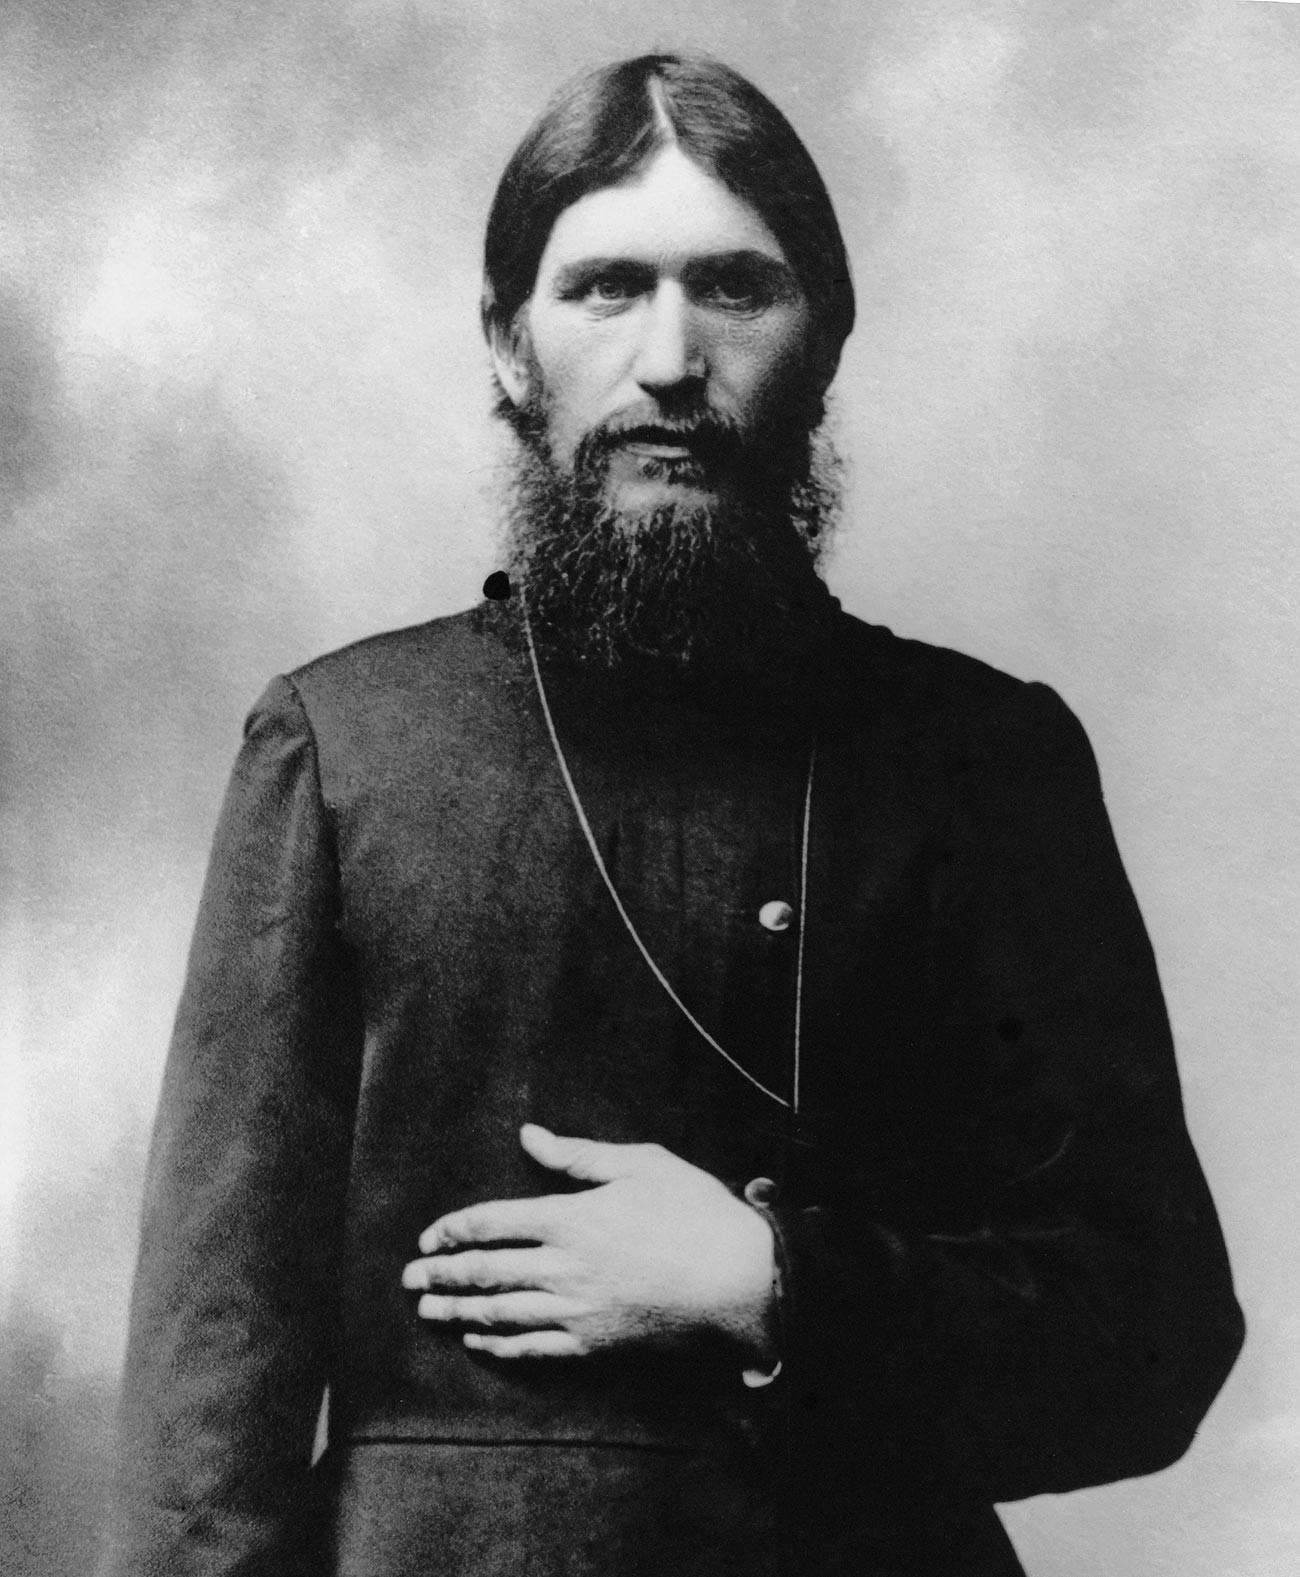 Grigorij Rasputin leta 1904 pri 35 letih